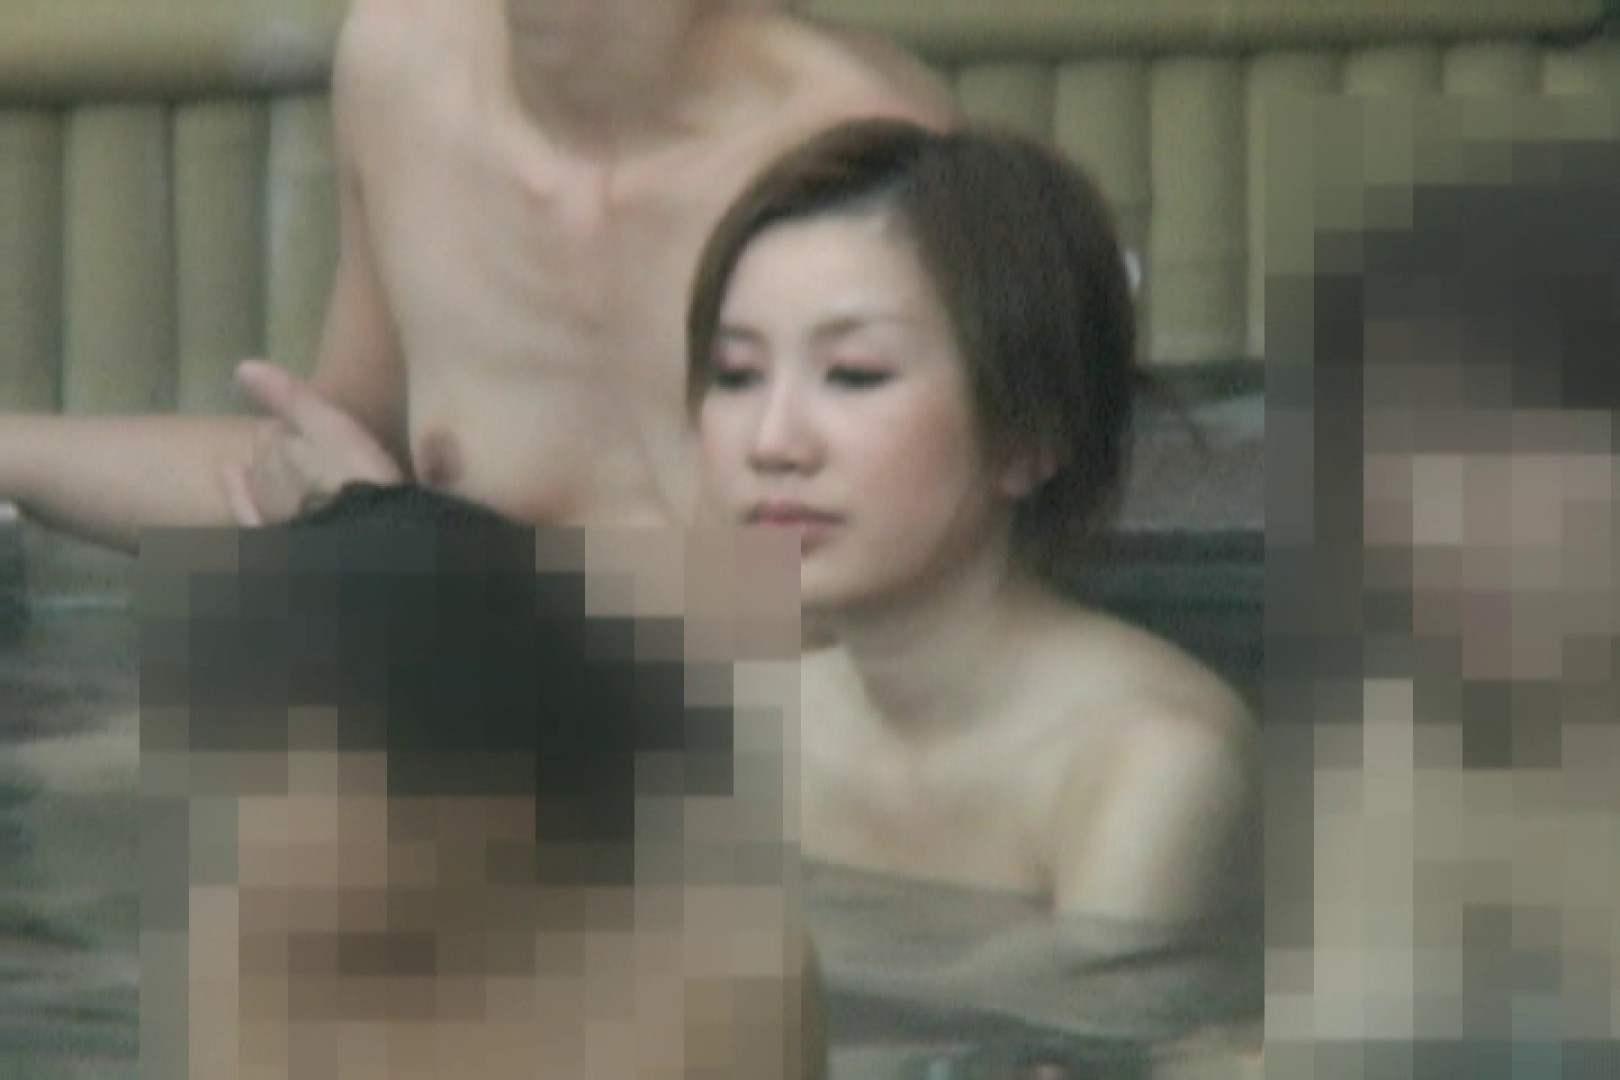 Aquaな露天風呂Vol.857 0  91連発 36